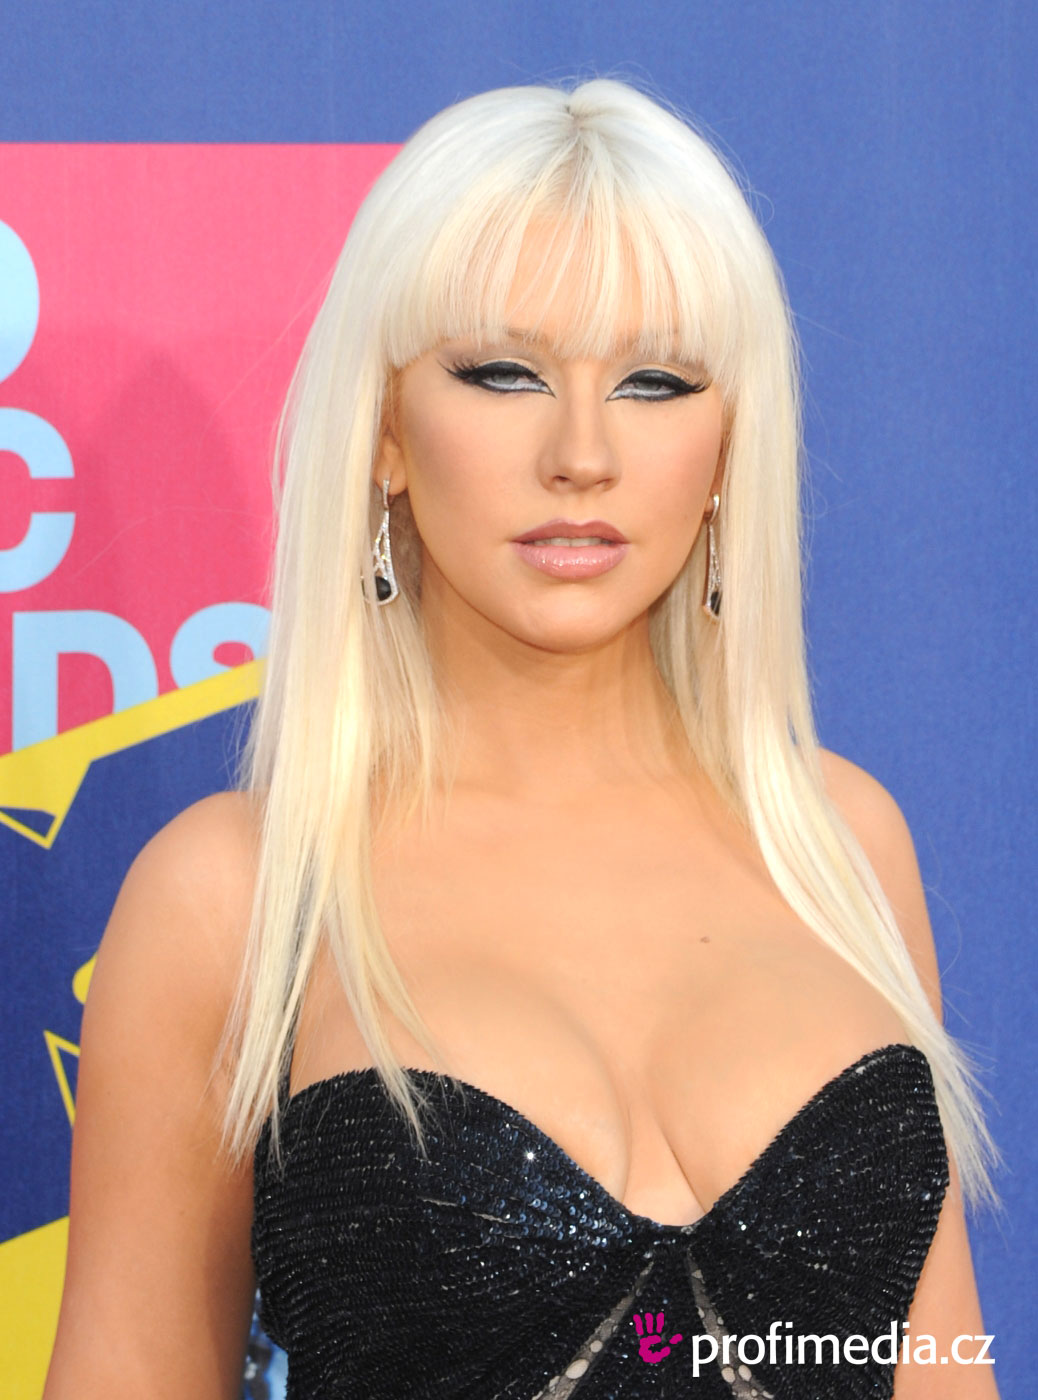 Christina Aguilera - Photo Colection